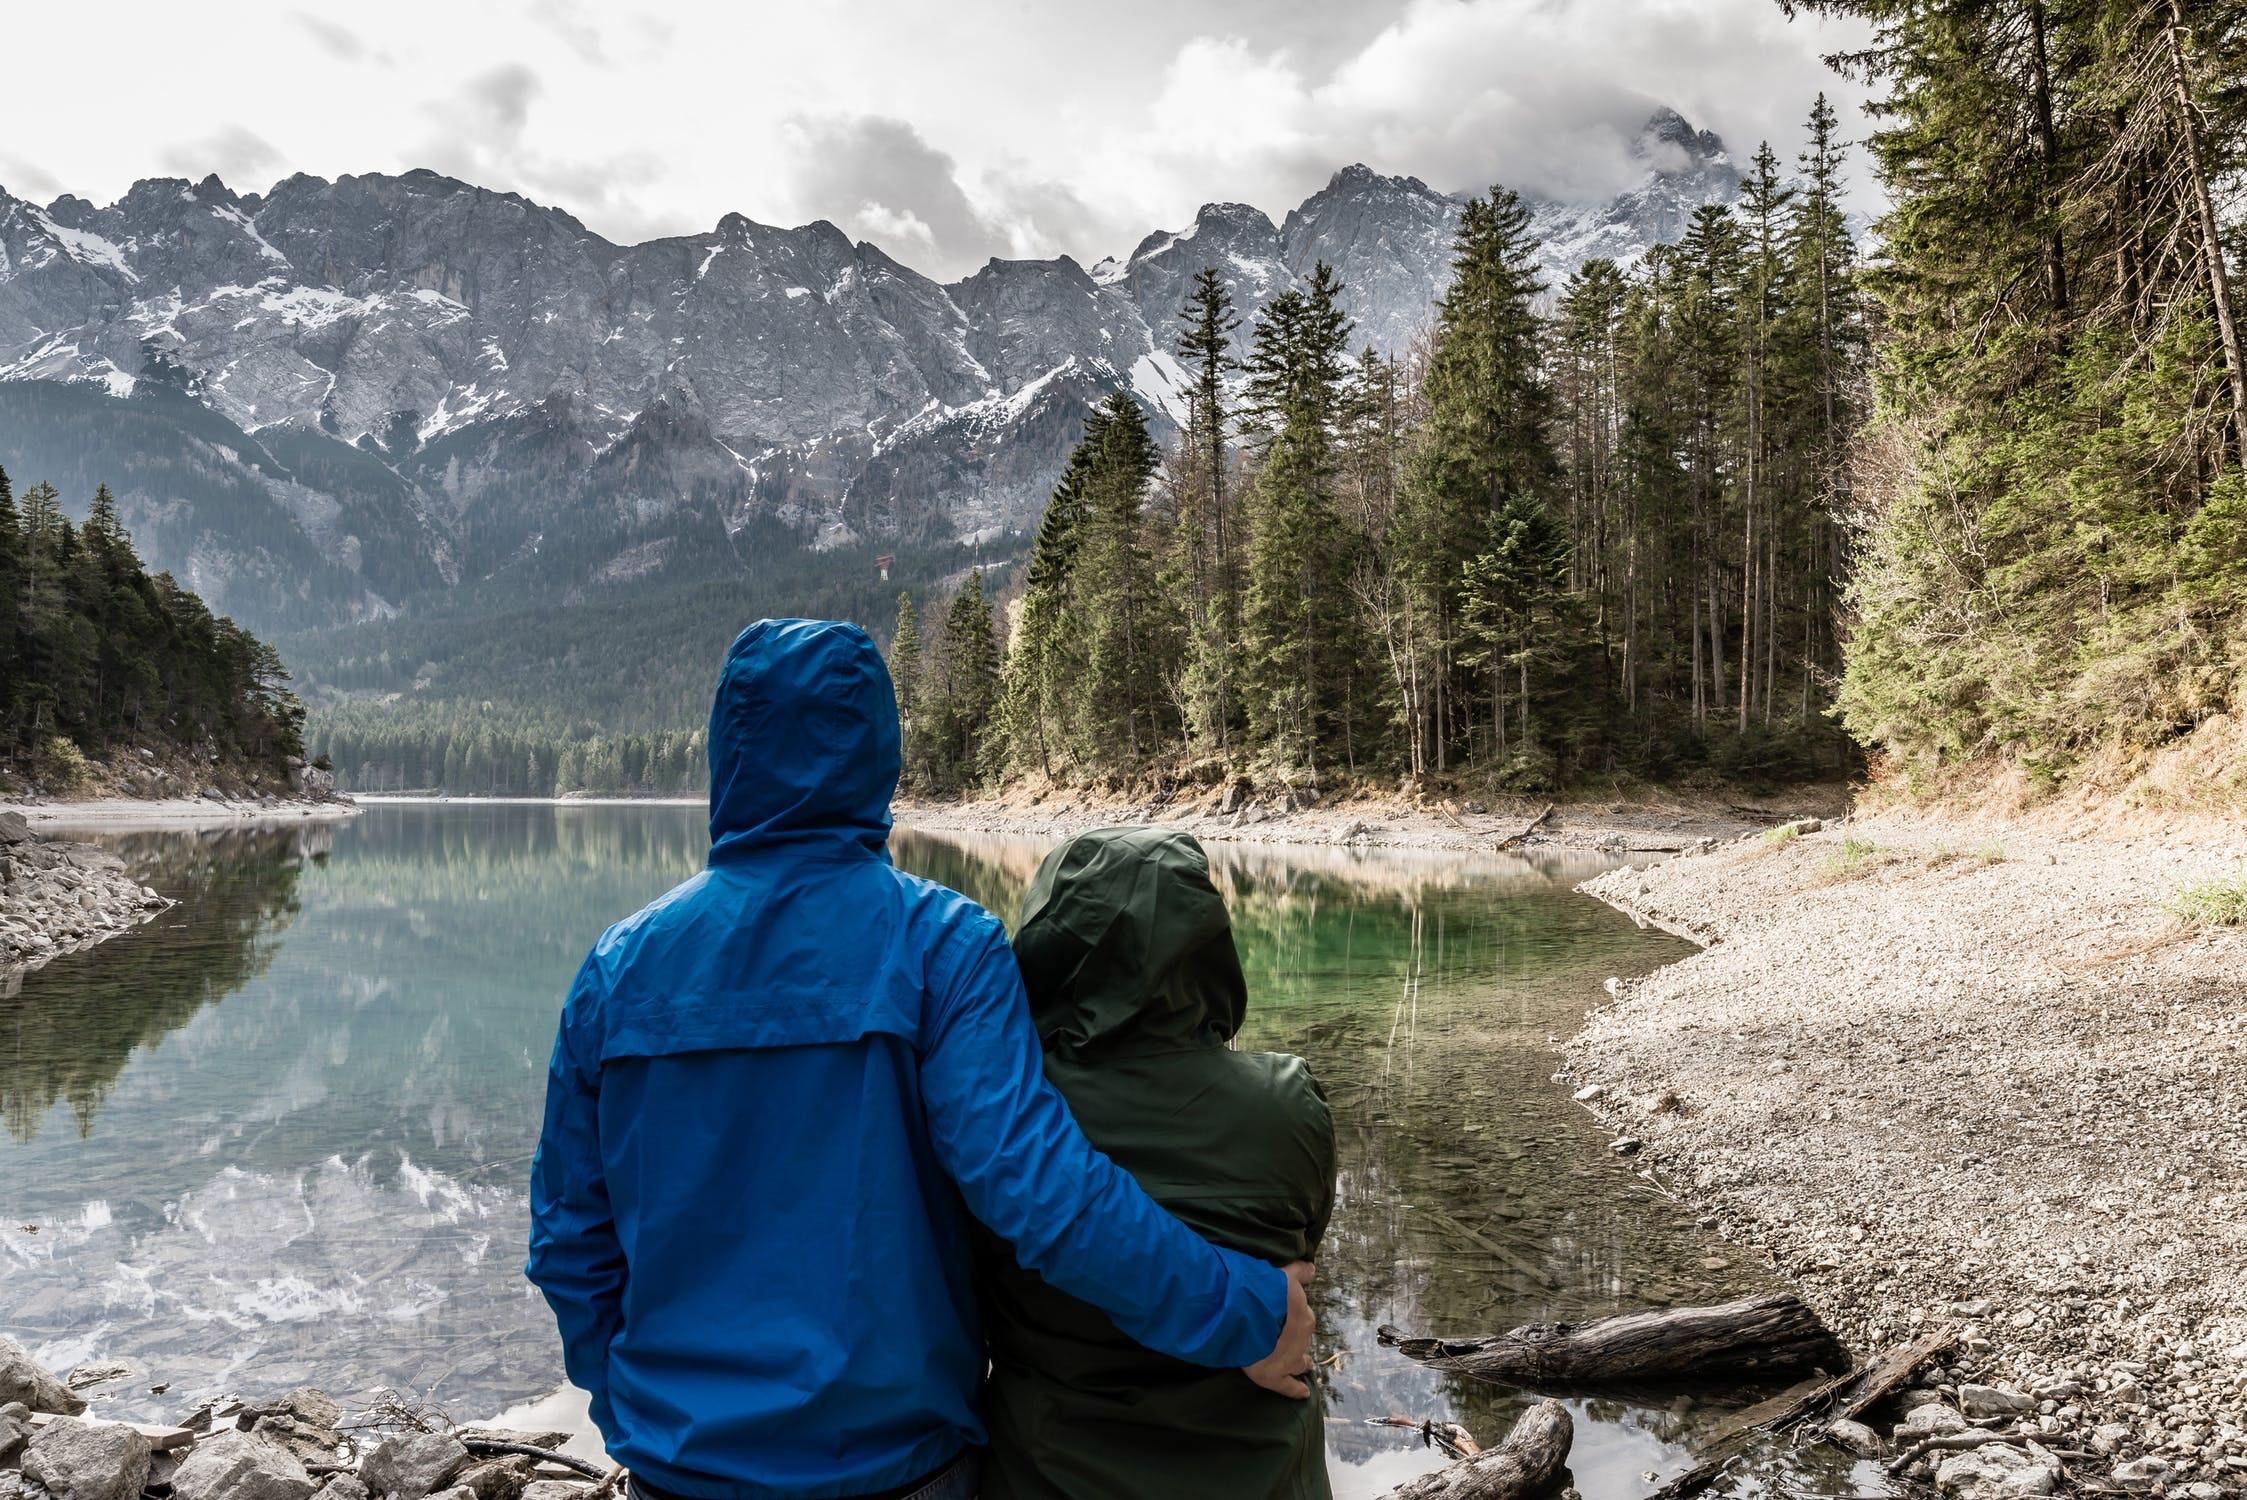 Bavarian national park mountain lake trees